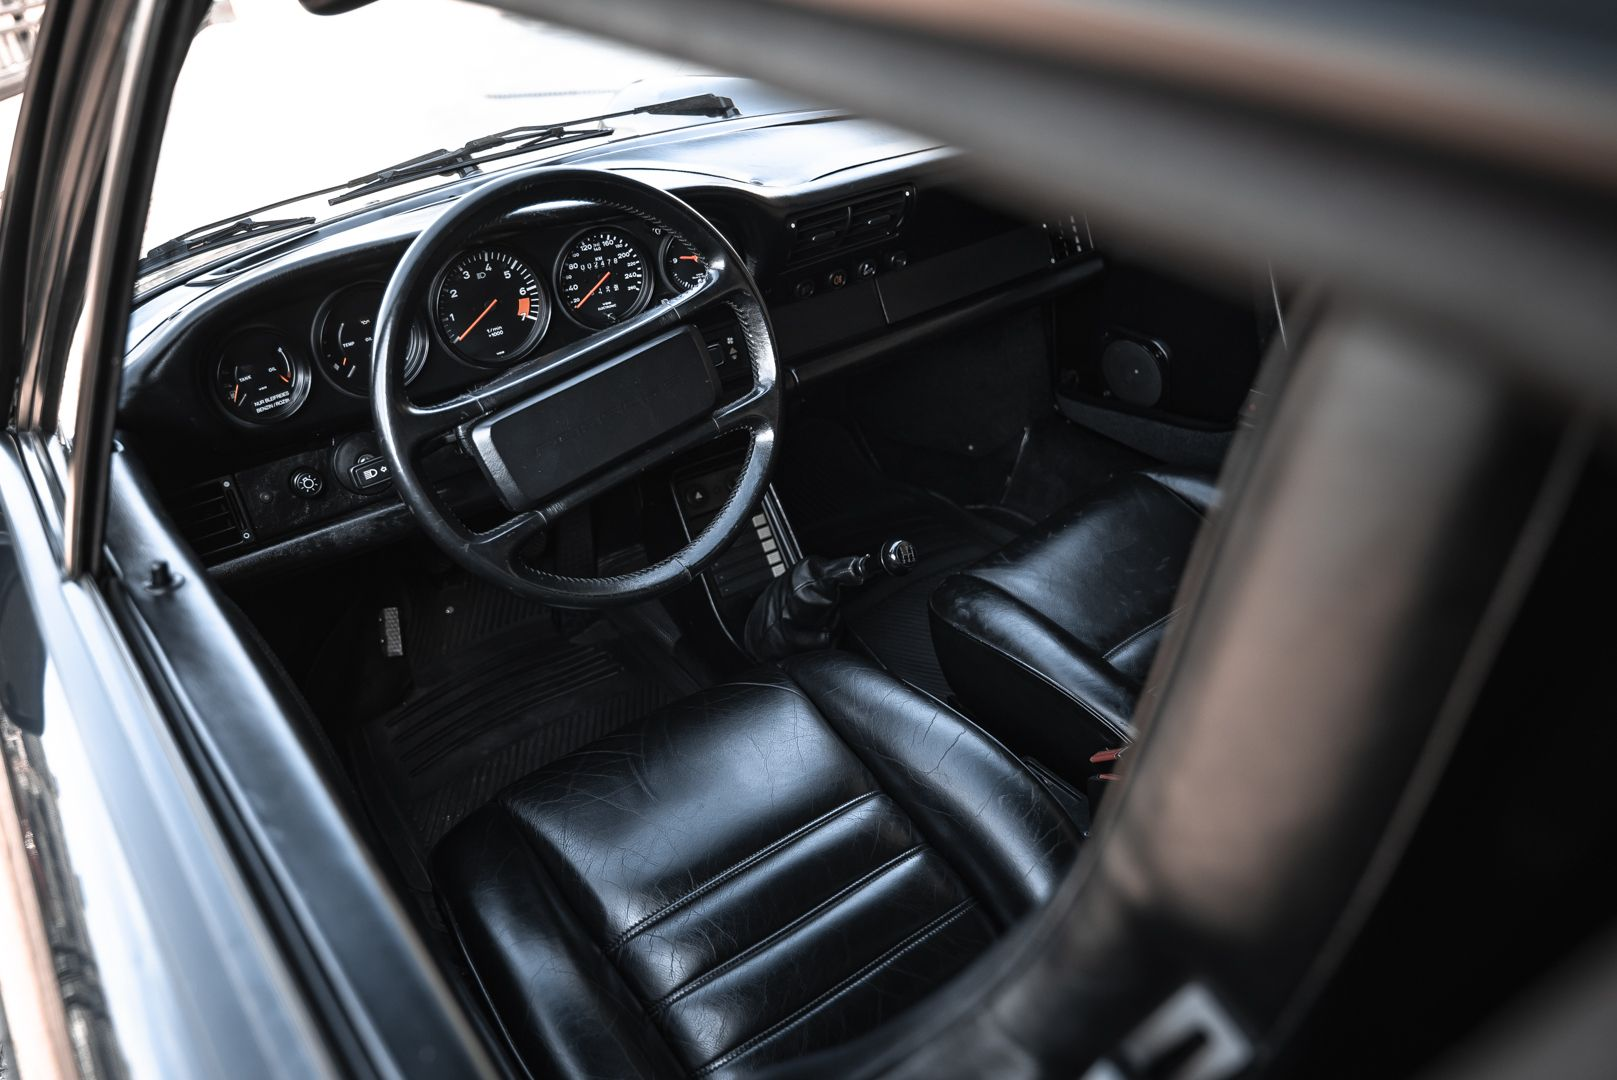 1986 Porsche 911 Carrera 3.2 Cabrio 70911